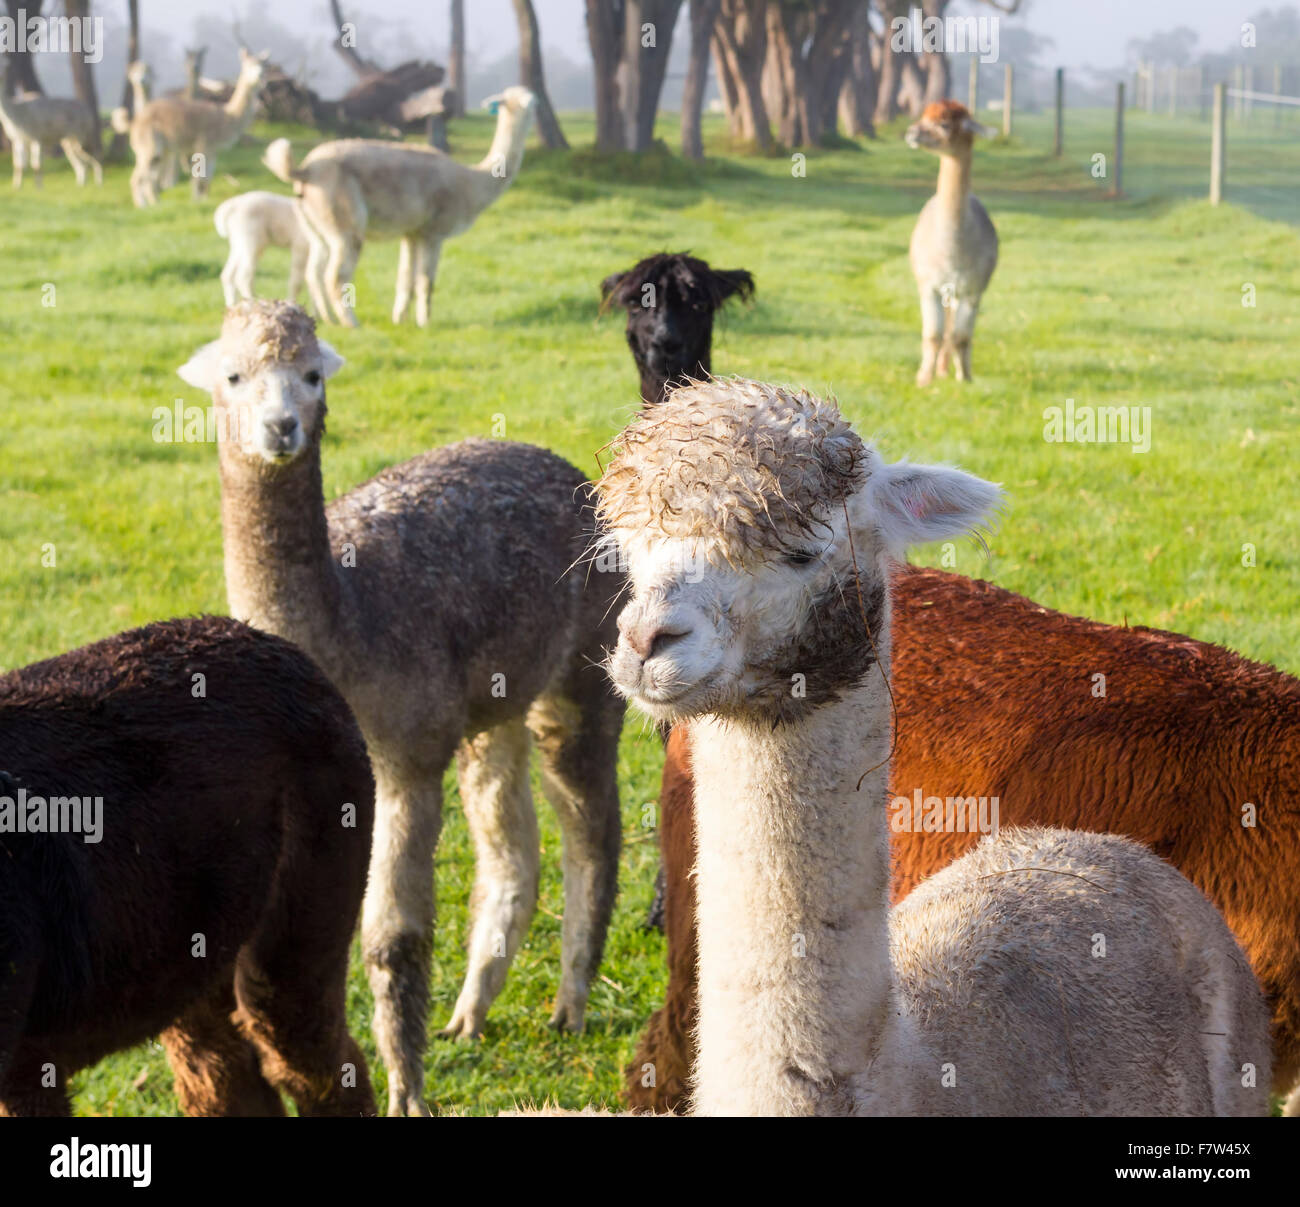 Alpaca group being farmed in Australia - Stock Image